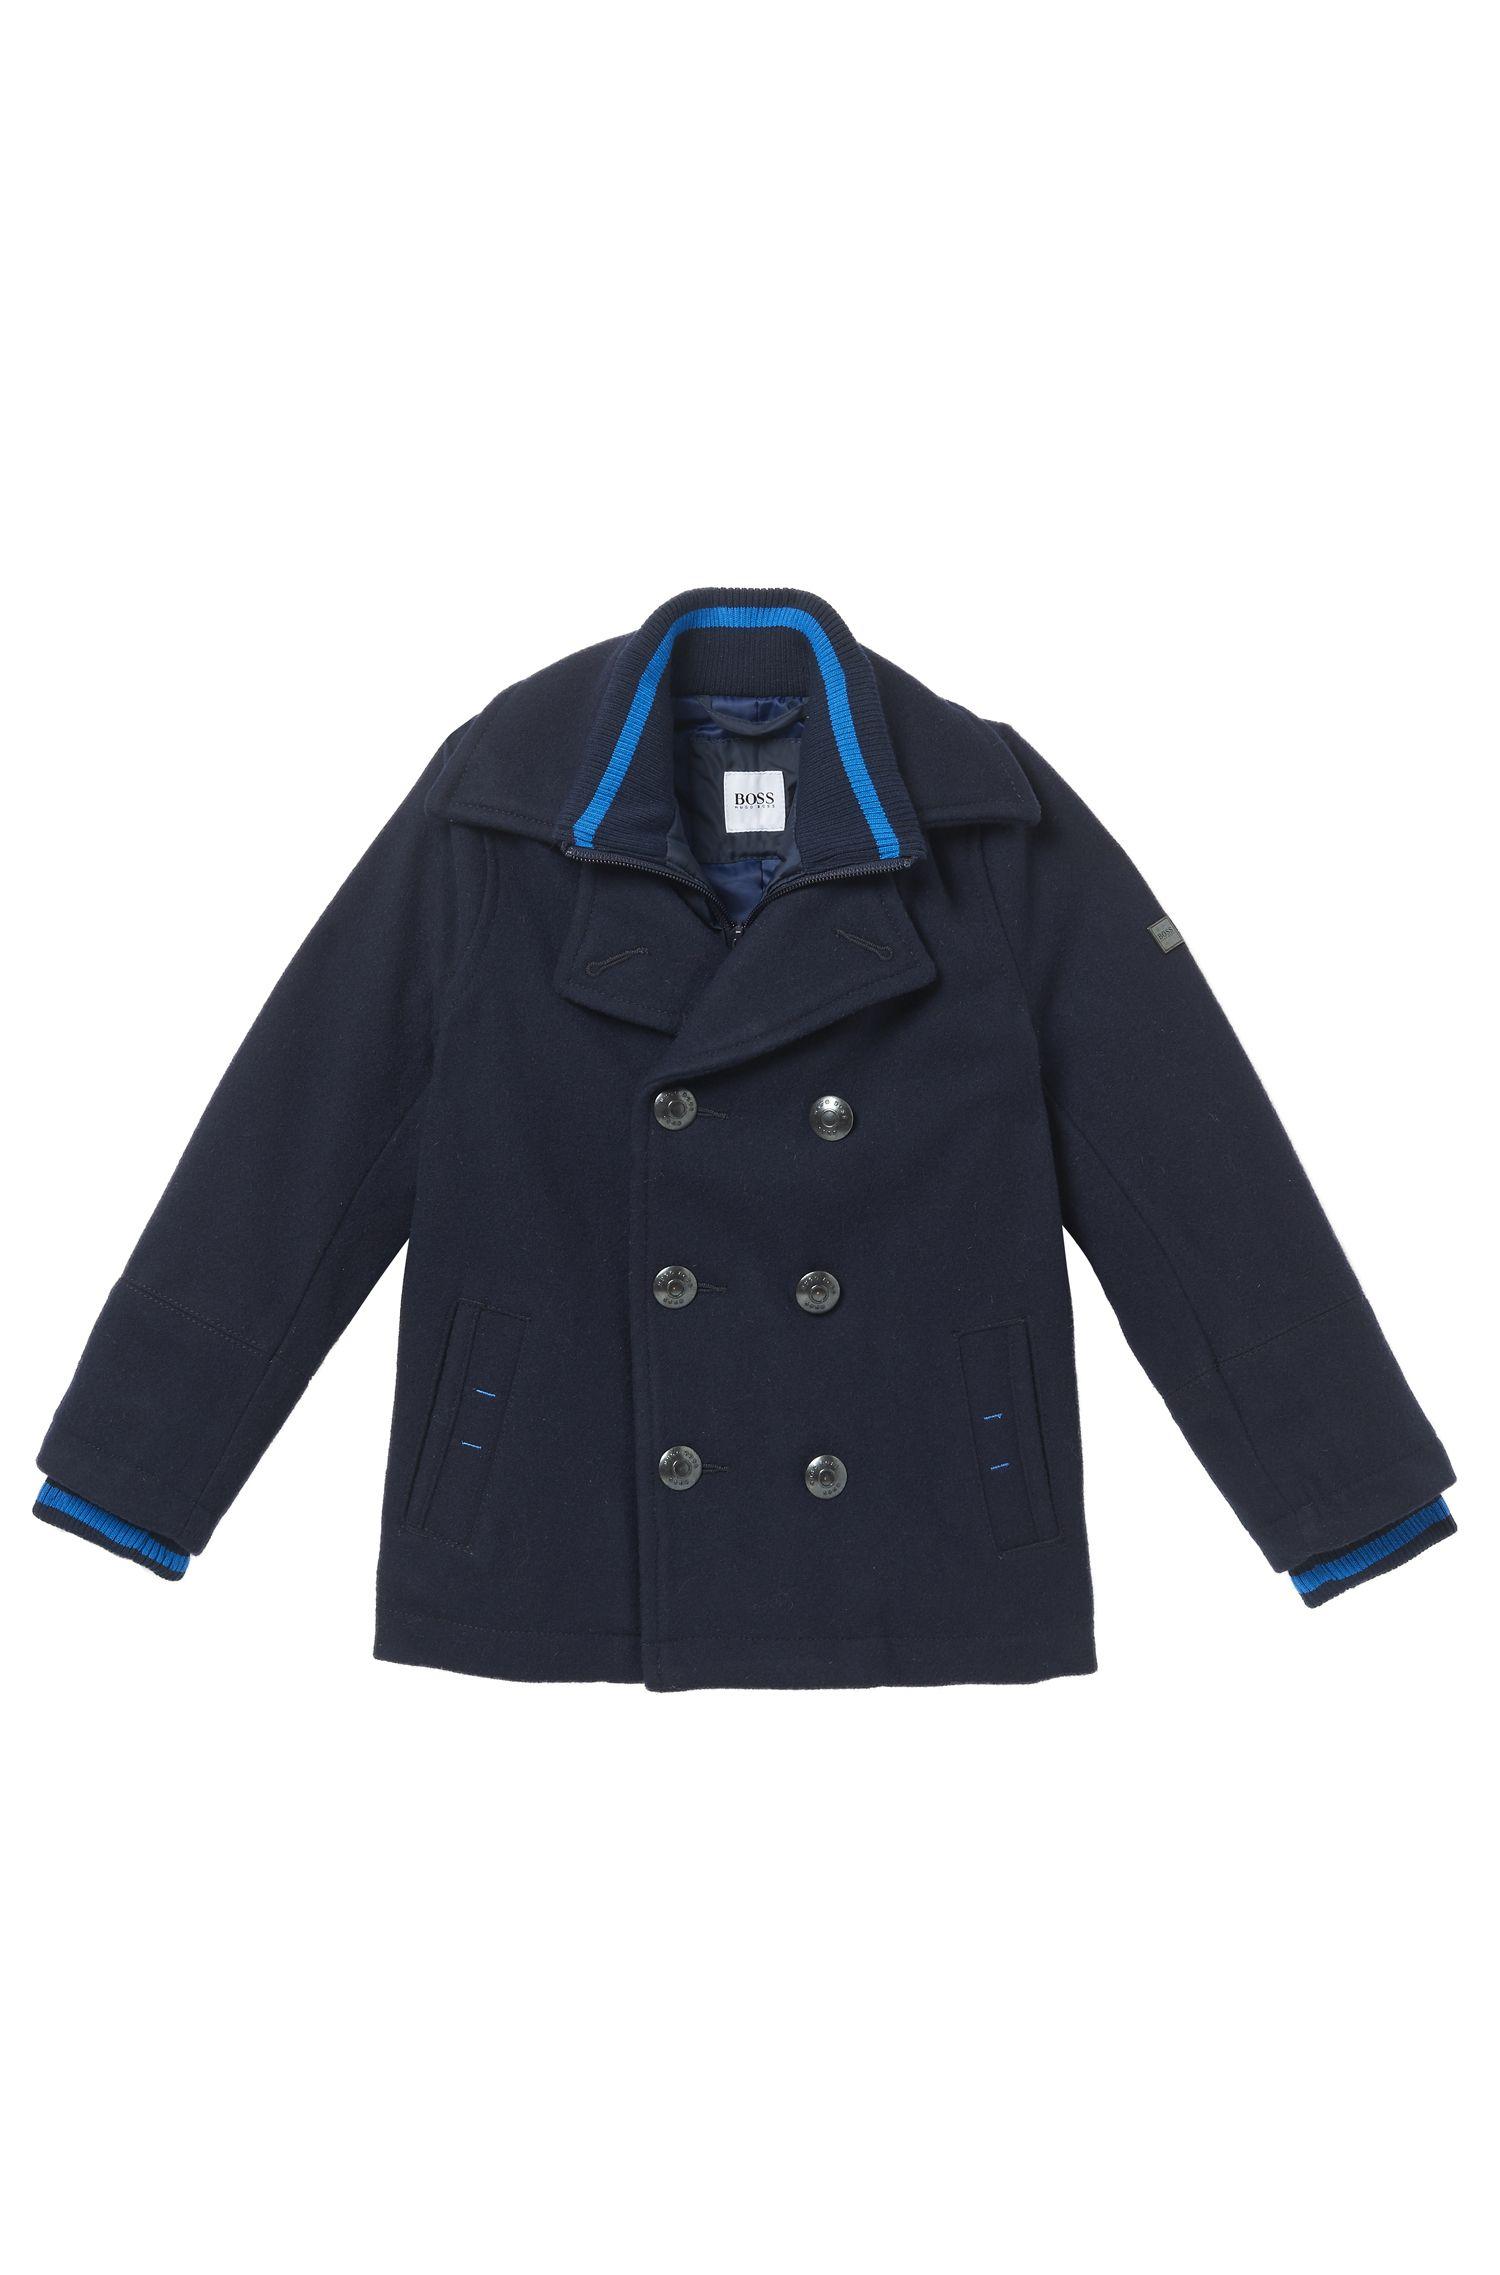 'J26287' | Boys Layered Pea Coat